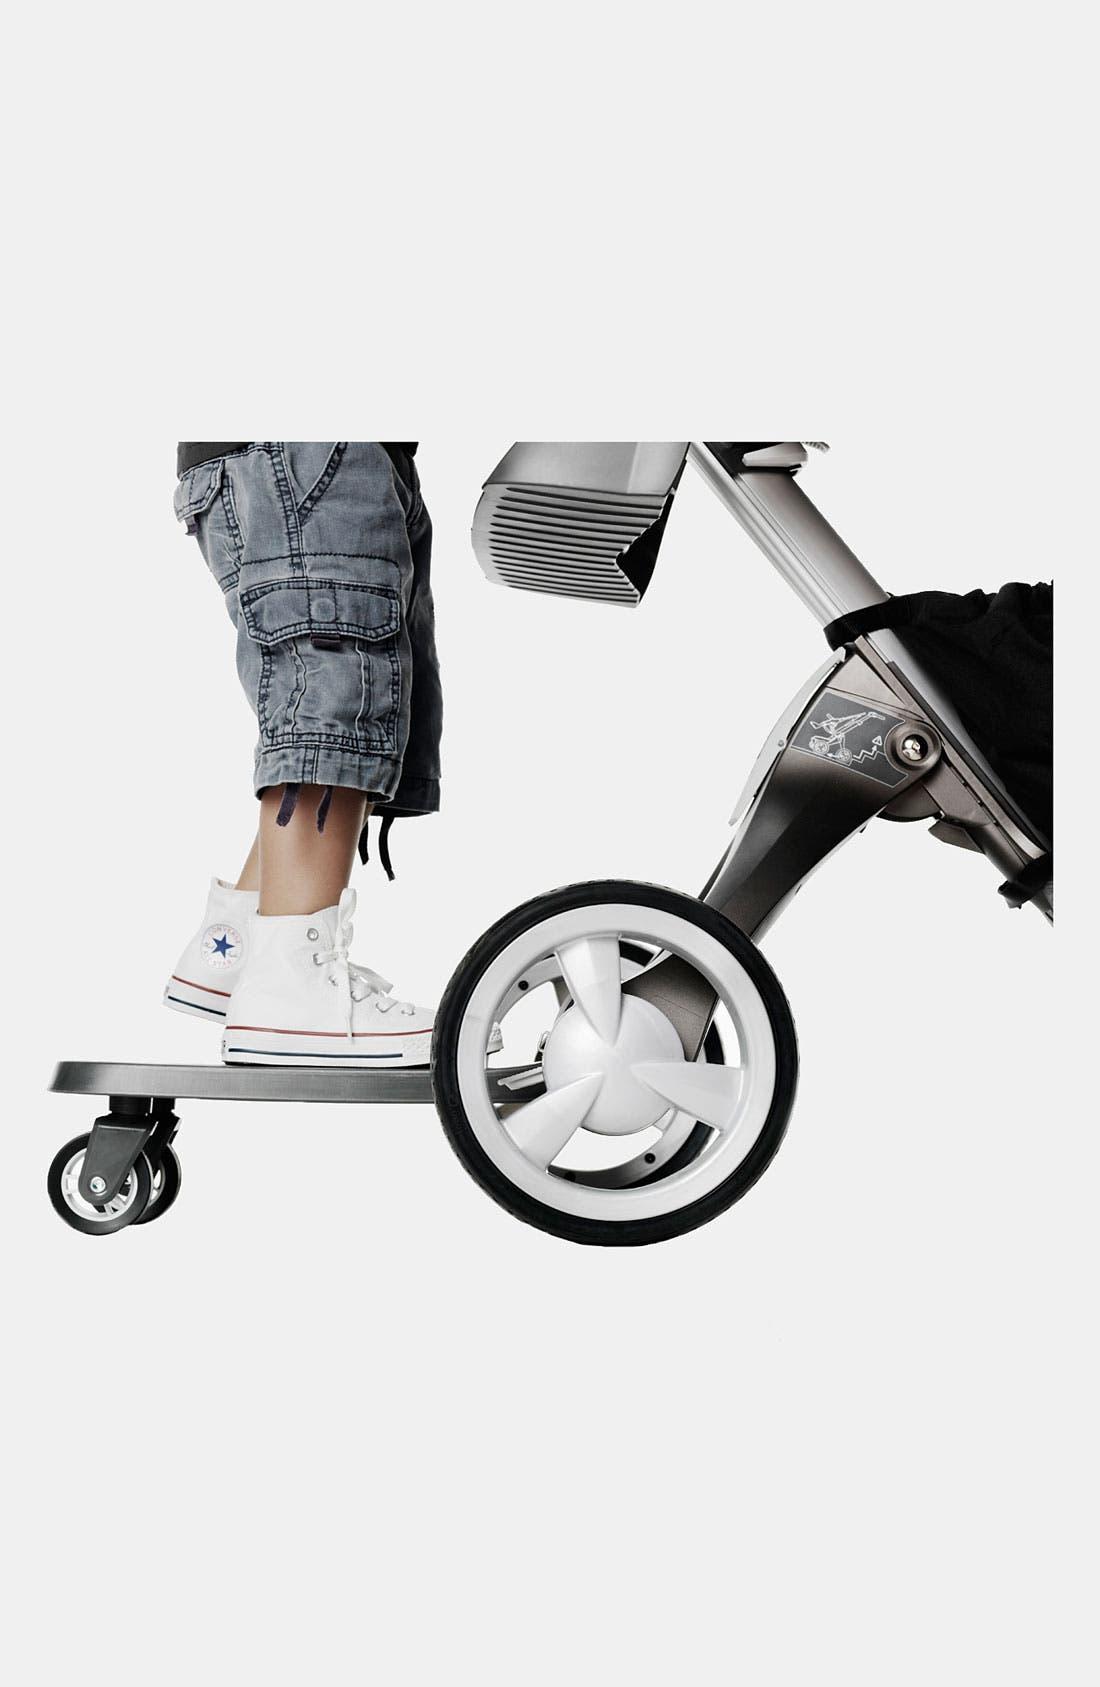 Main Image - Stokke 'Xplory®' Stroller Rider